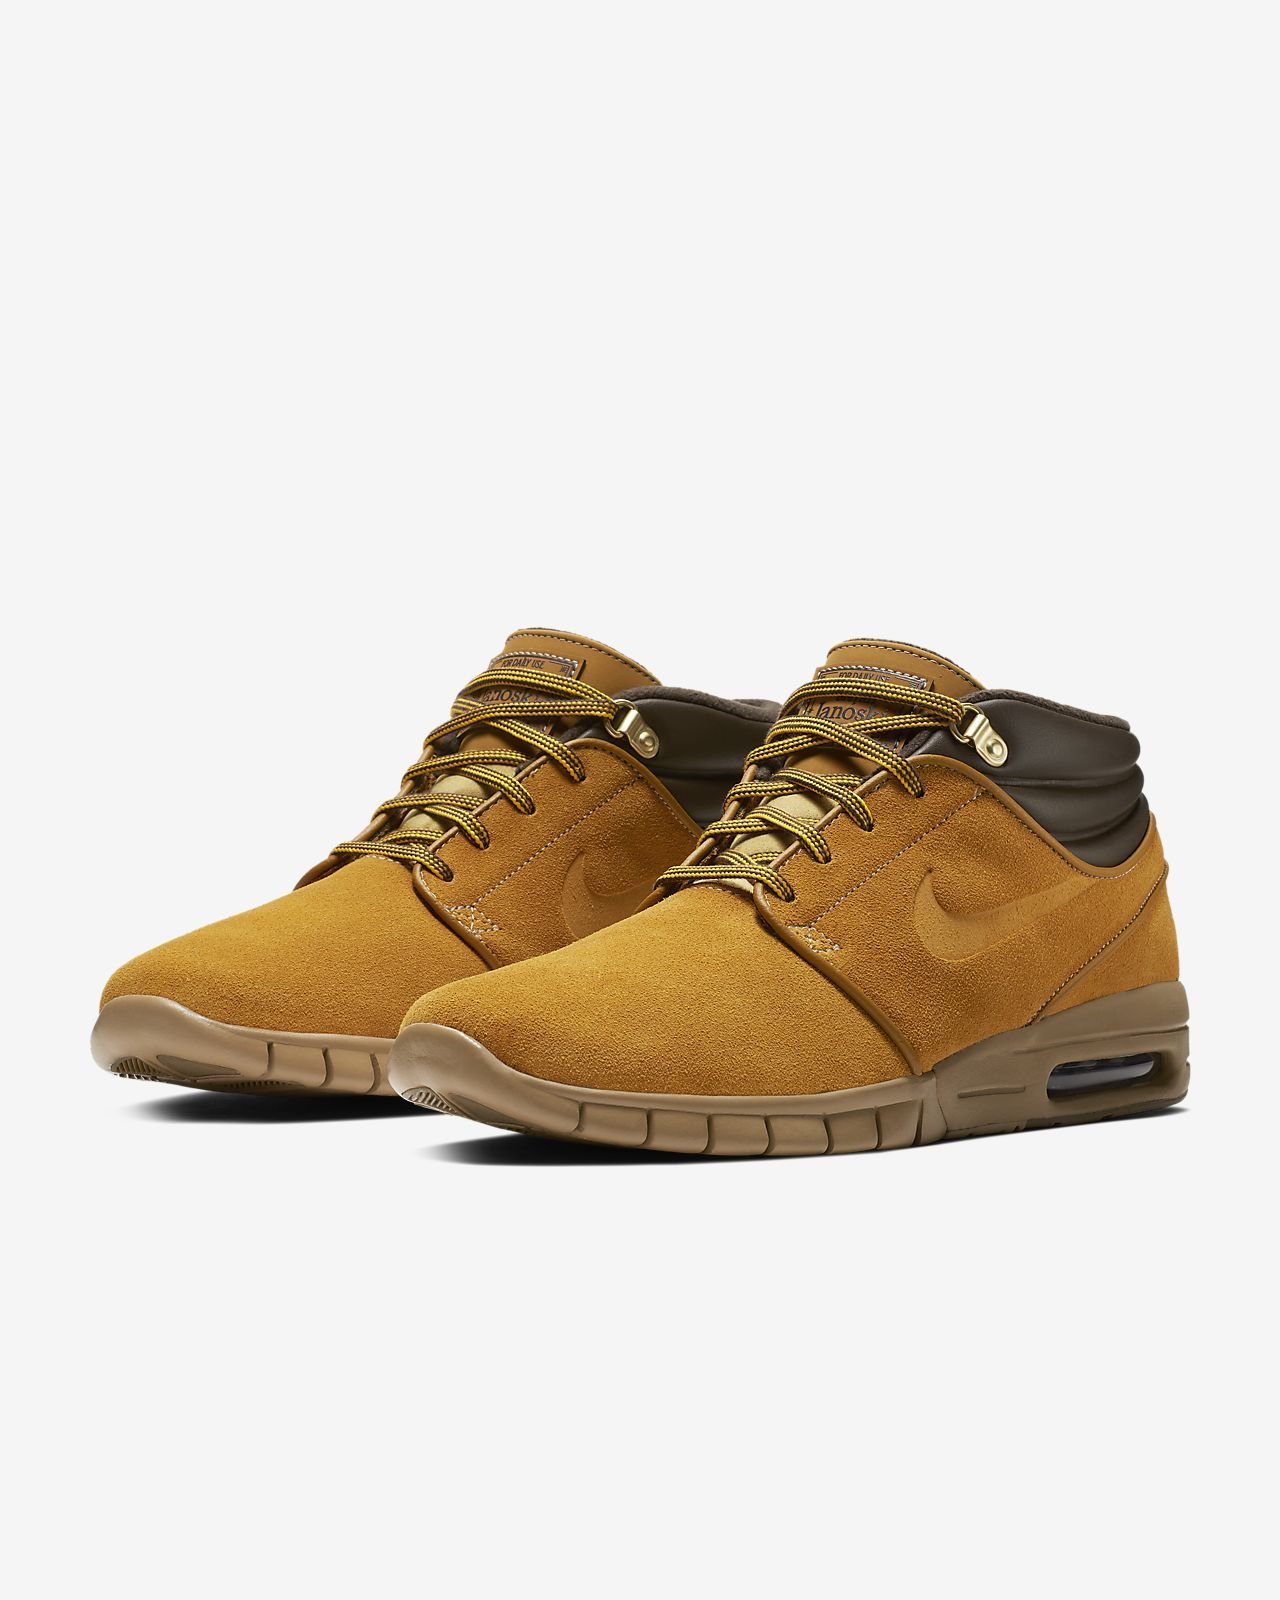 outlet store ce4a2 99882 Nike SB Stefan Janoski Max Mid Premium Men s Skateboarding Shoe